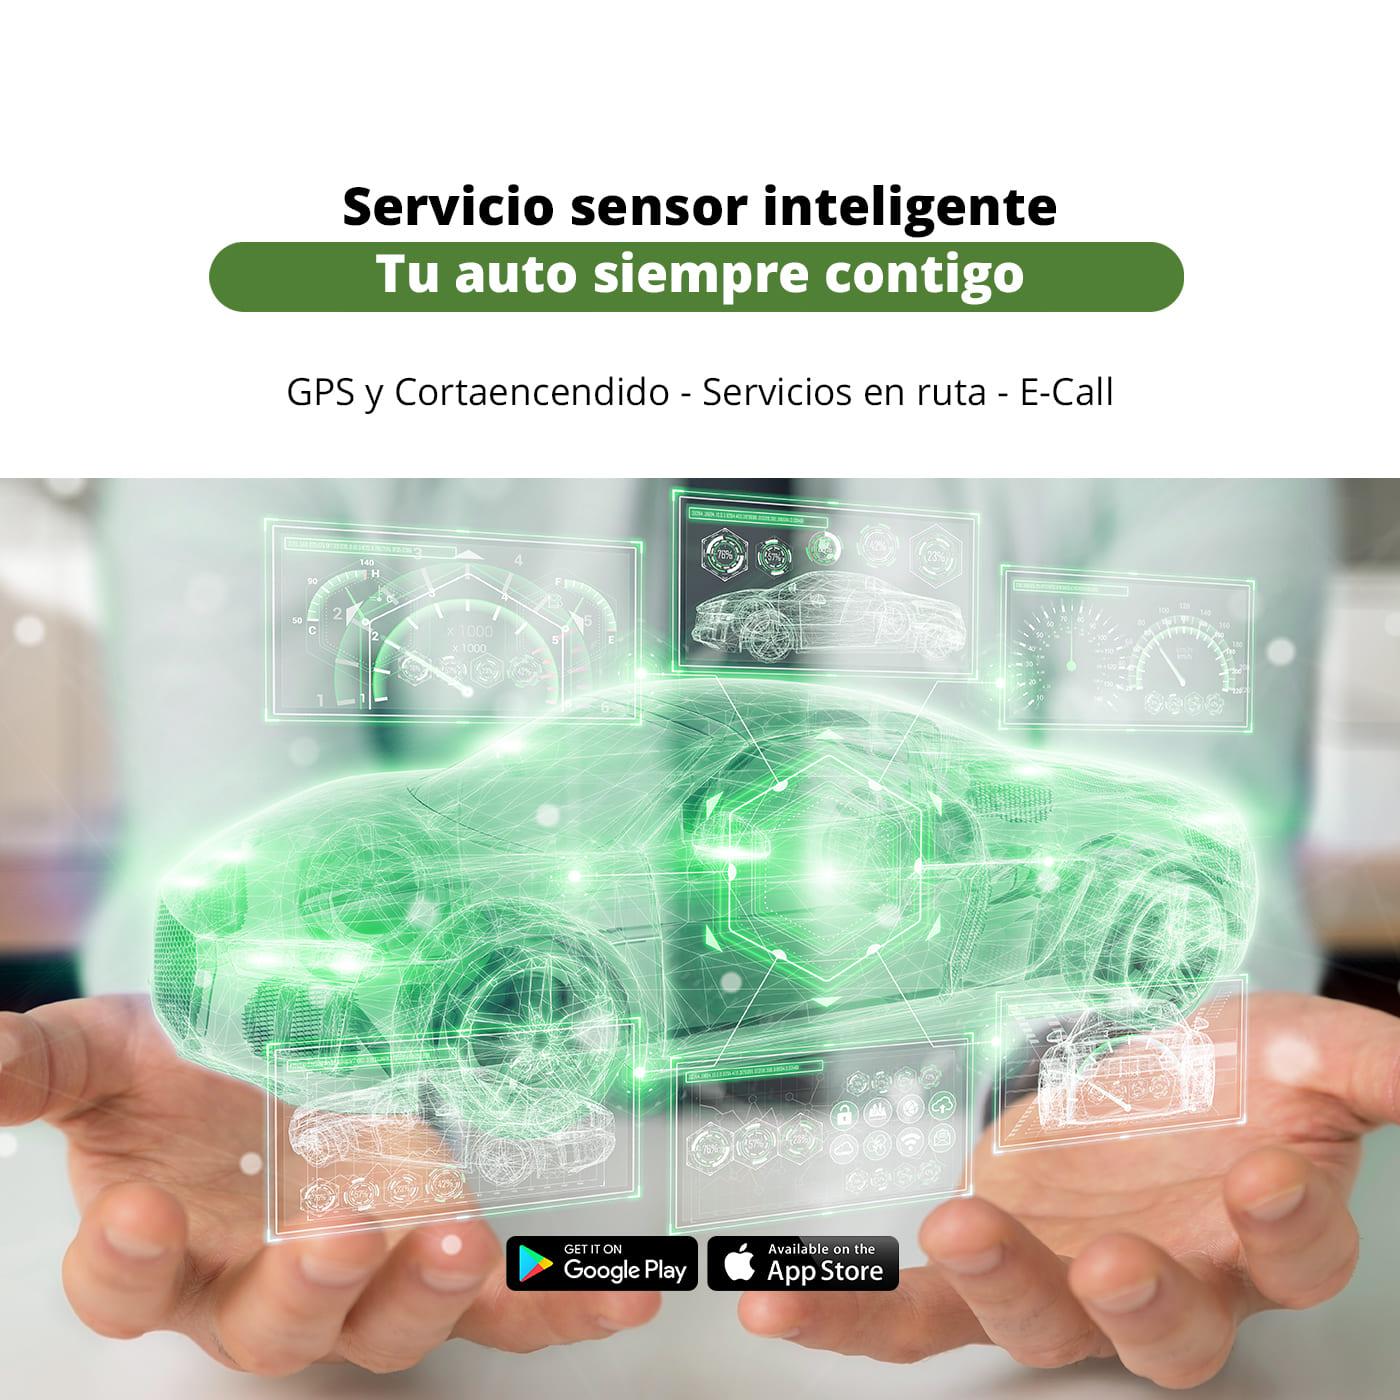 servicio-sensor-inteligente